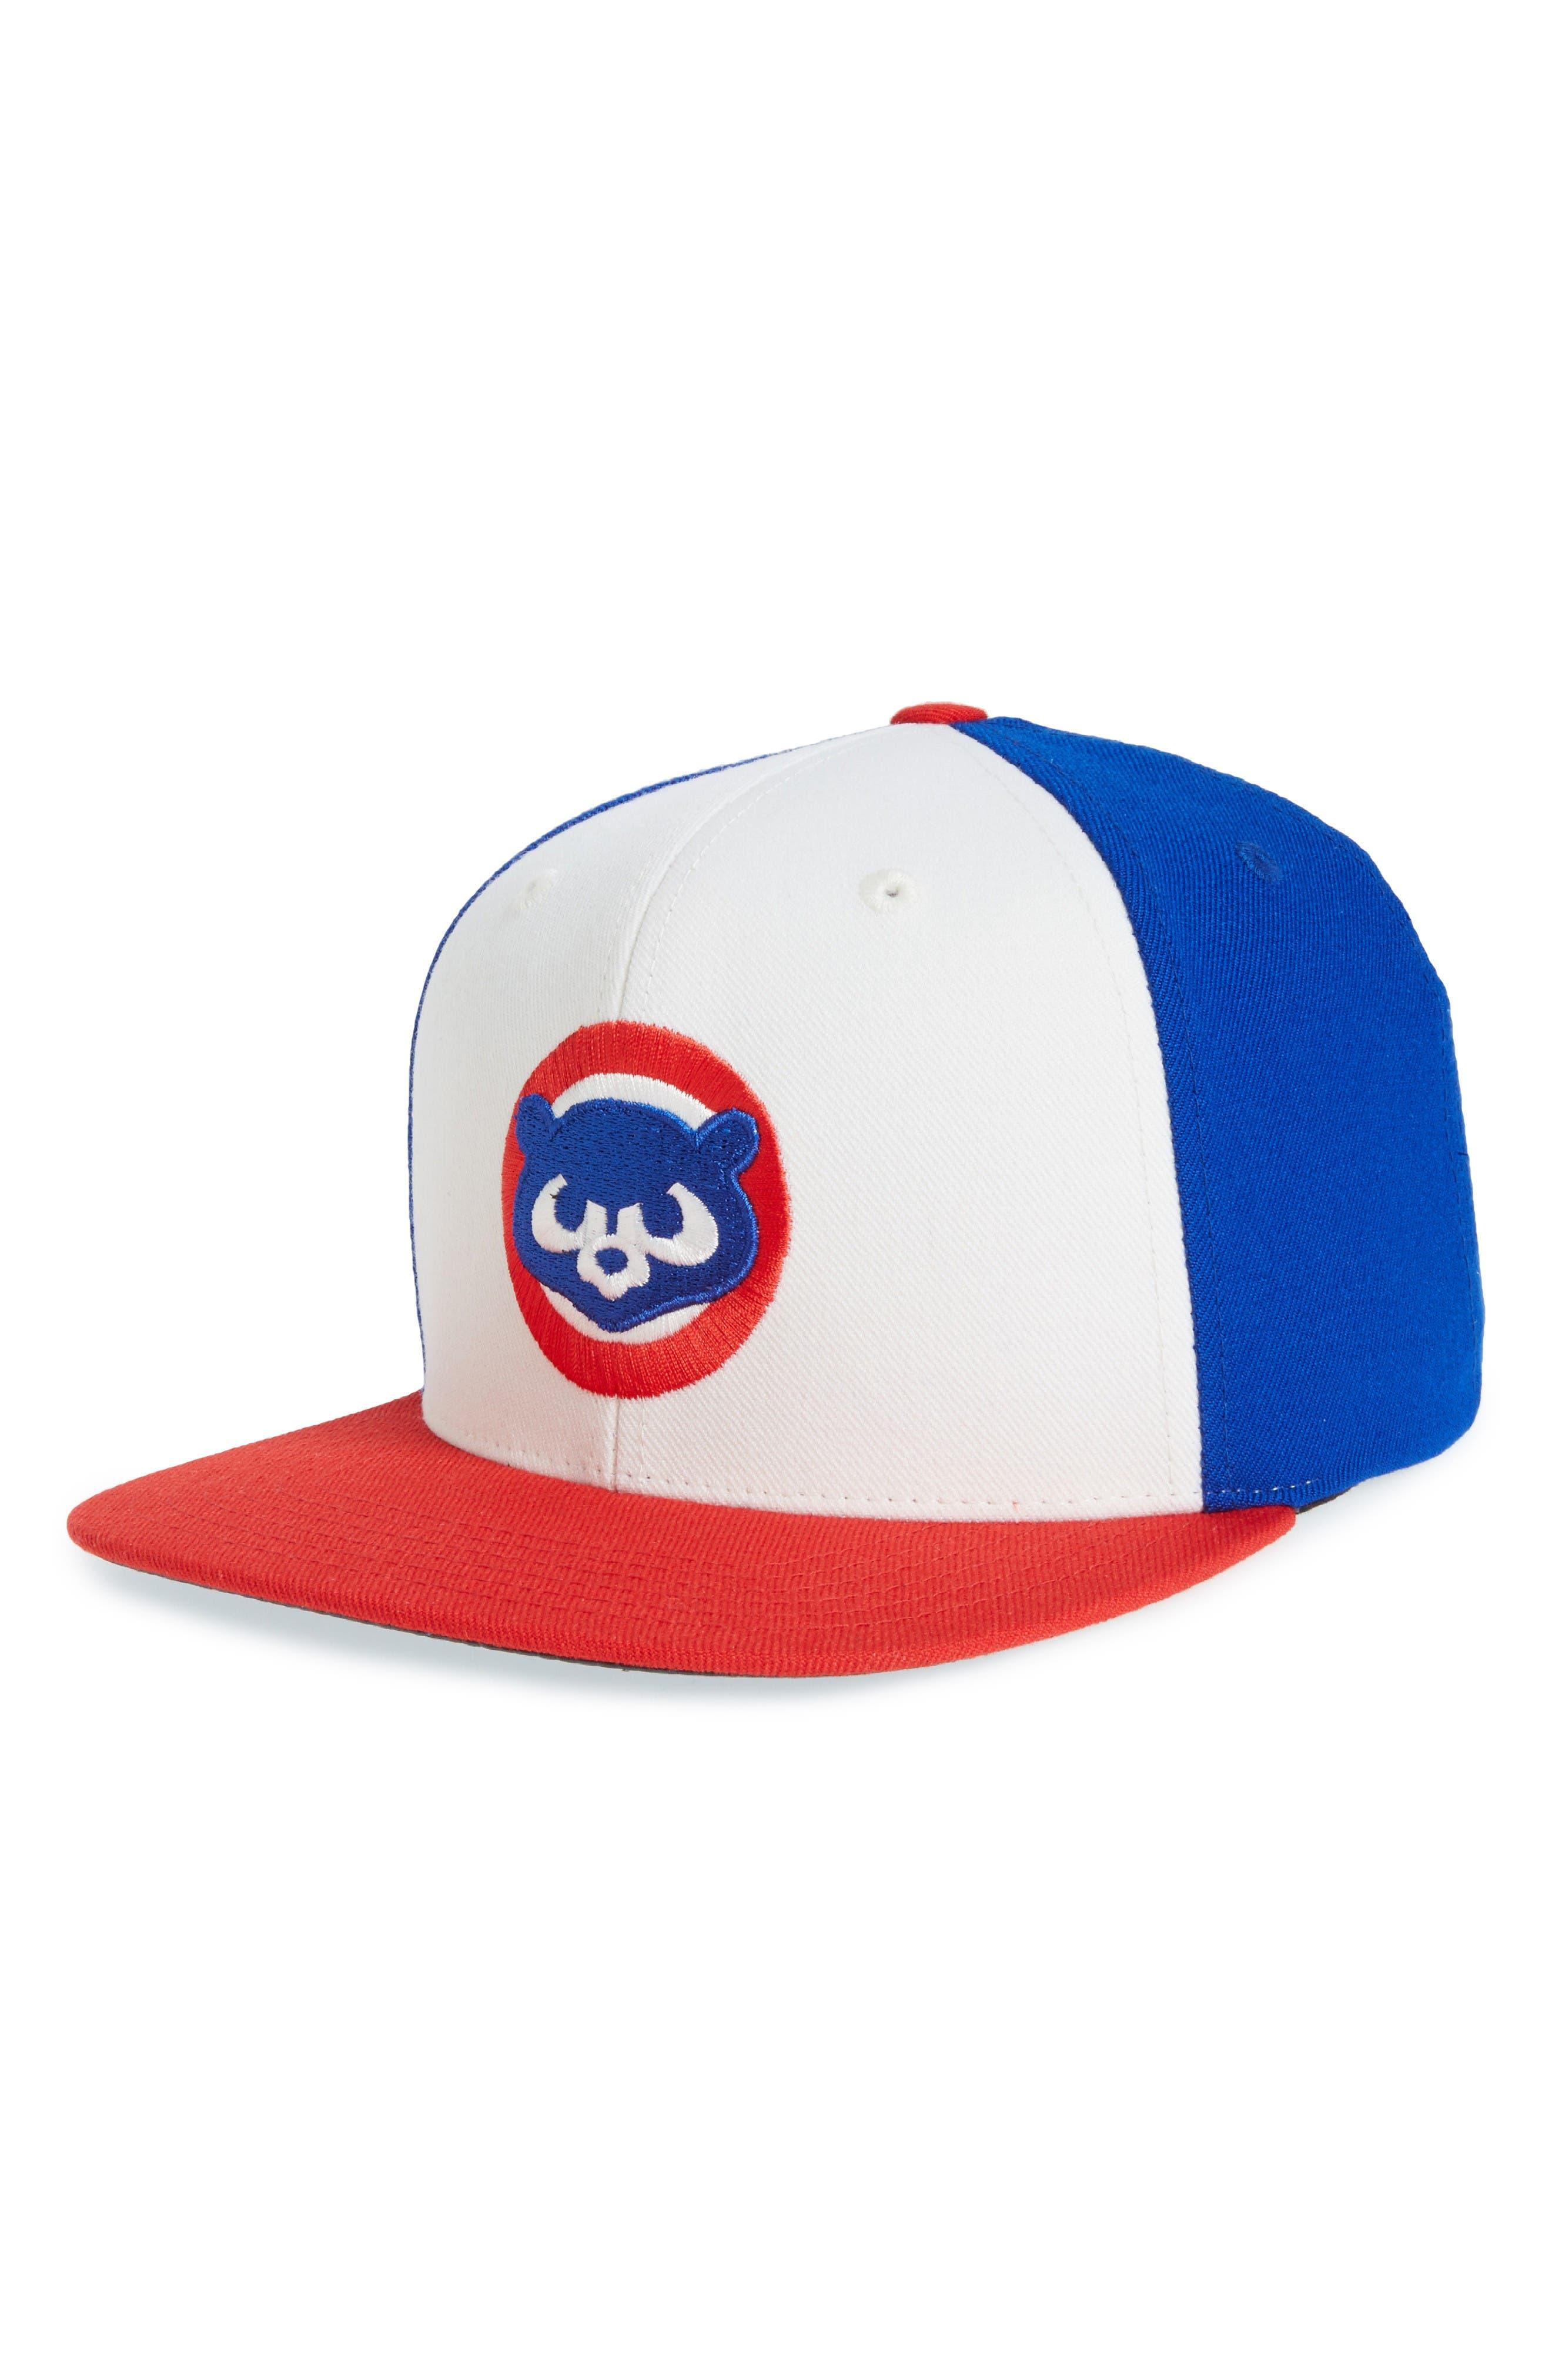 Alternate Image 1 Selected - American Needle The Big Show MLB Snapback Baseball Cap